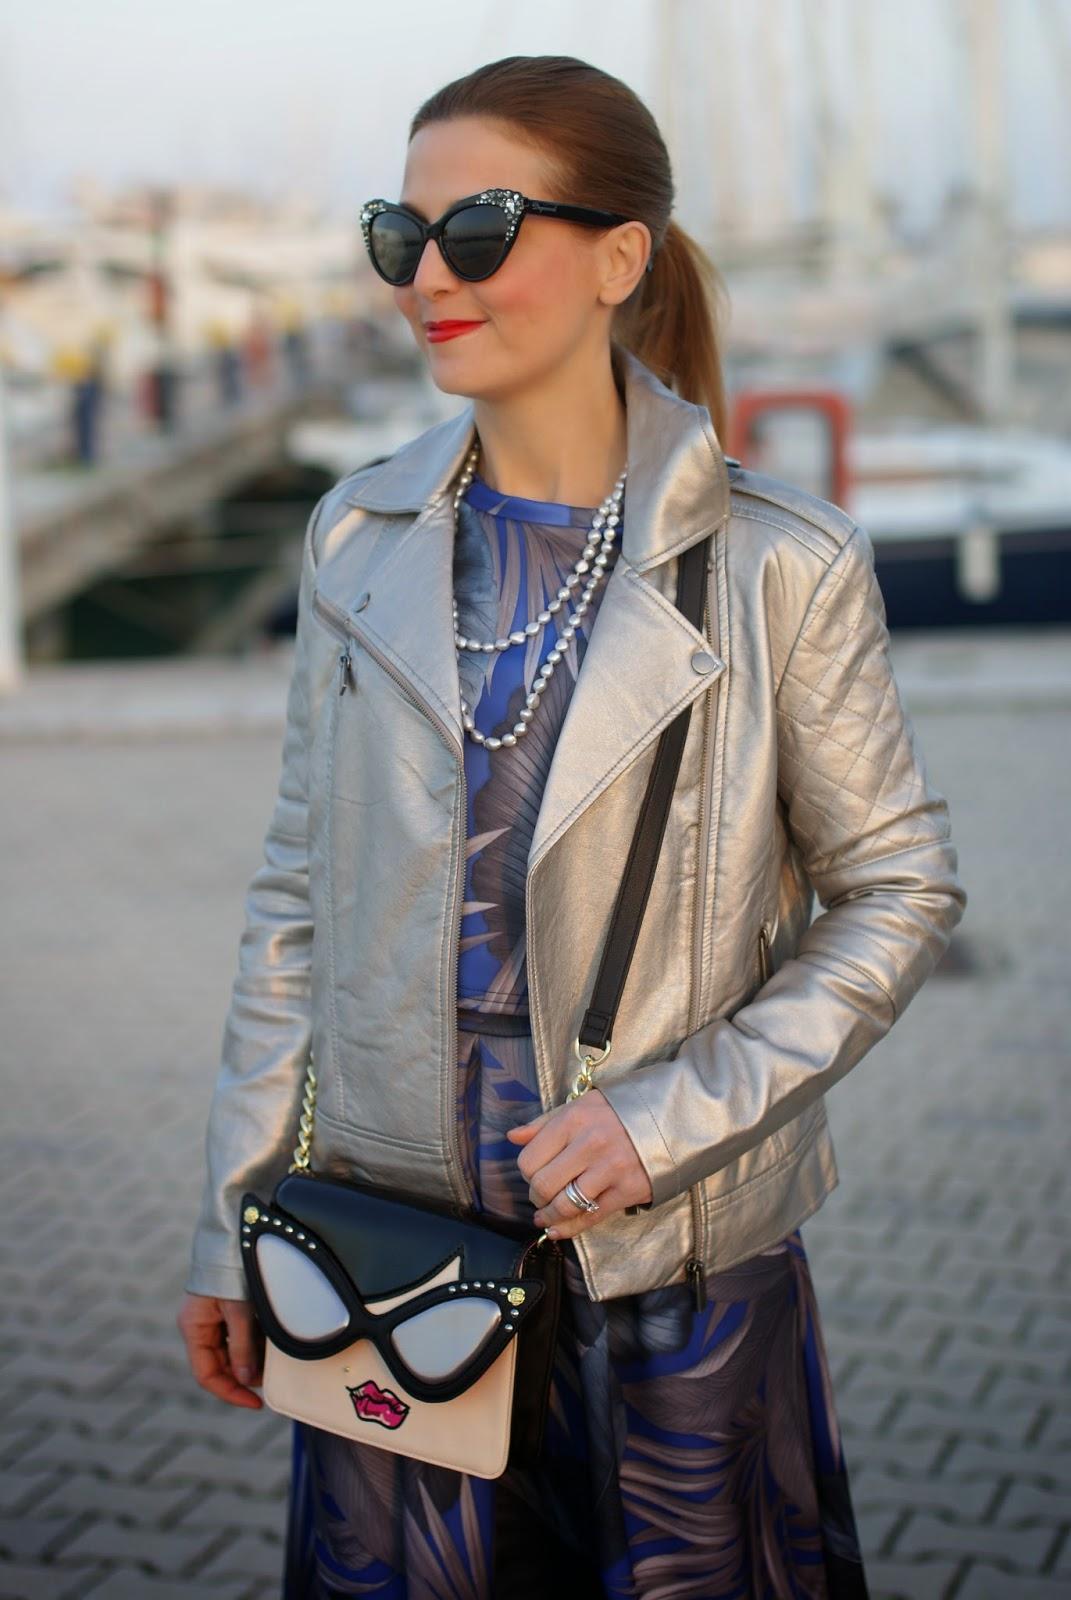 Betsey Johnson crossbody bag, dsquared2 cat eye sunglasses, silver jacket, scuba midi skirt, Asos silver jacket, Fashion and Cookies fashion blog, fashion blogger